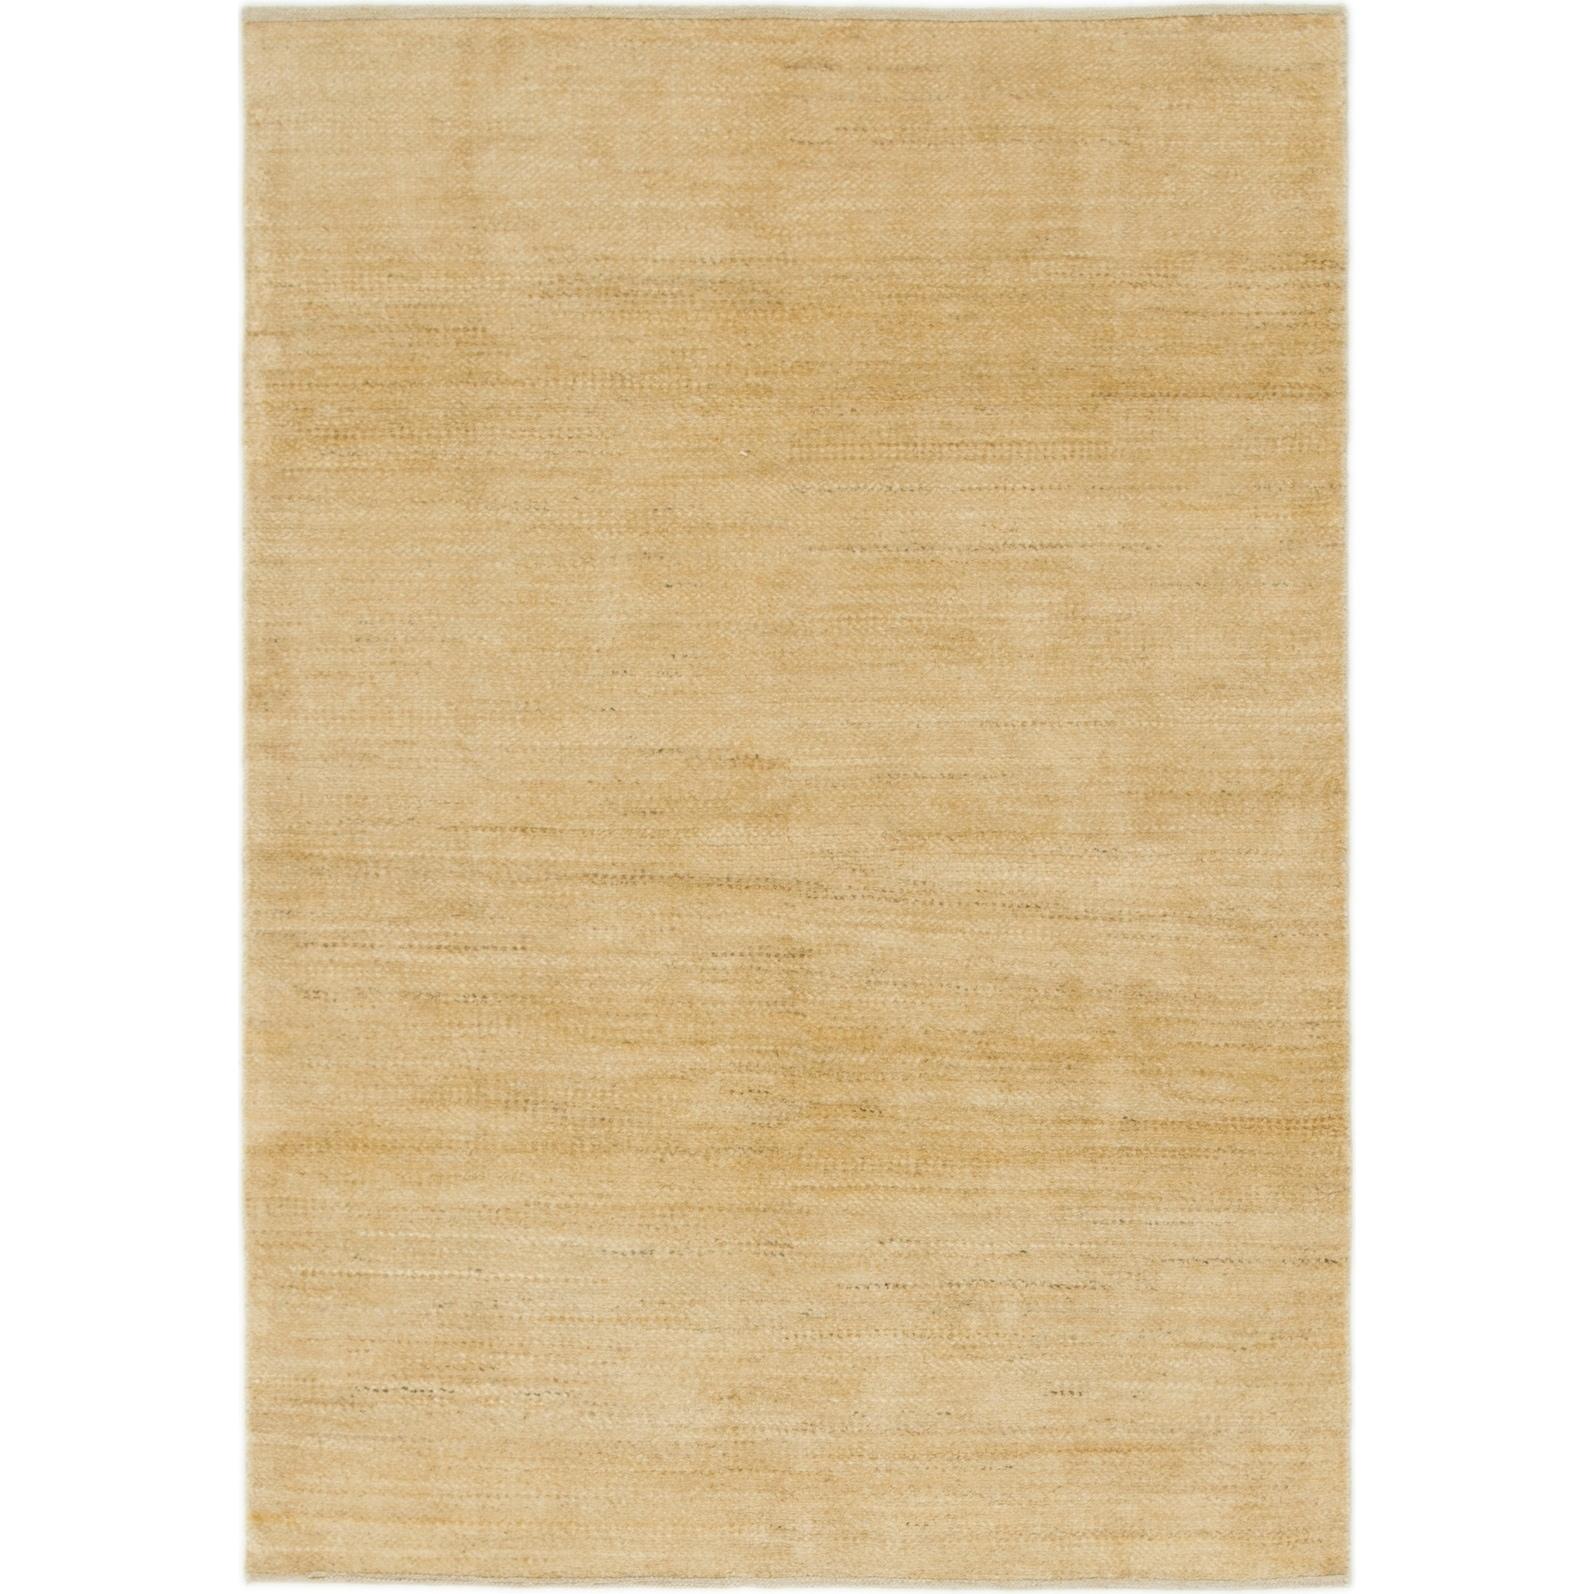 Hand Knotted Kashkuli Gabbeh Wool Area Rug - 4 1 x 5 10 (Beige - 4 1 x 5 10)